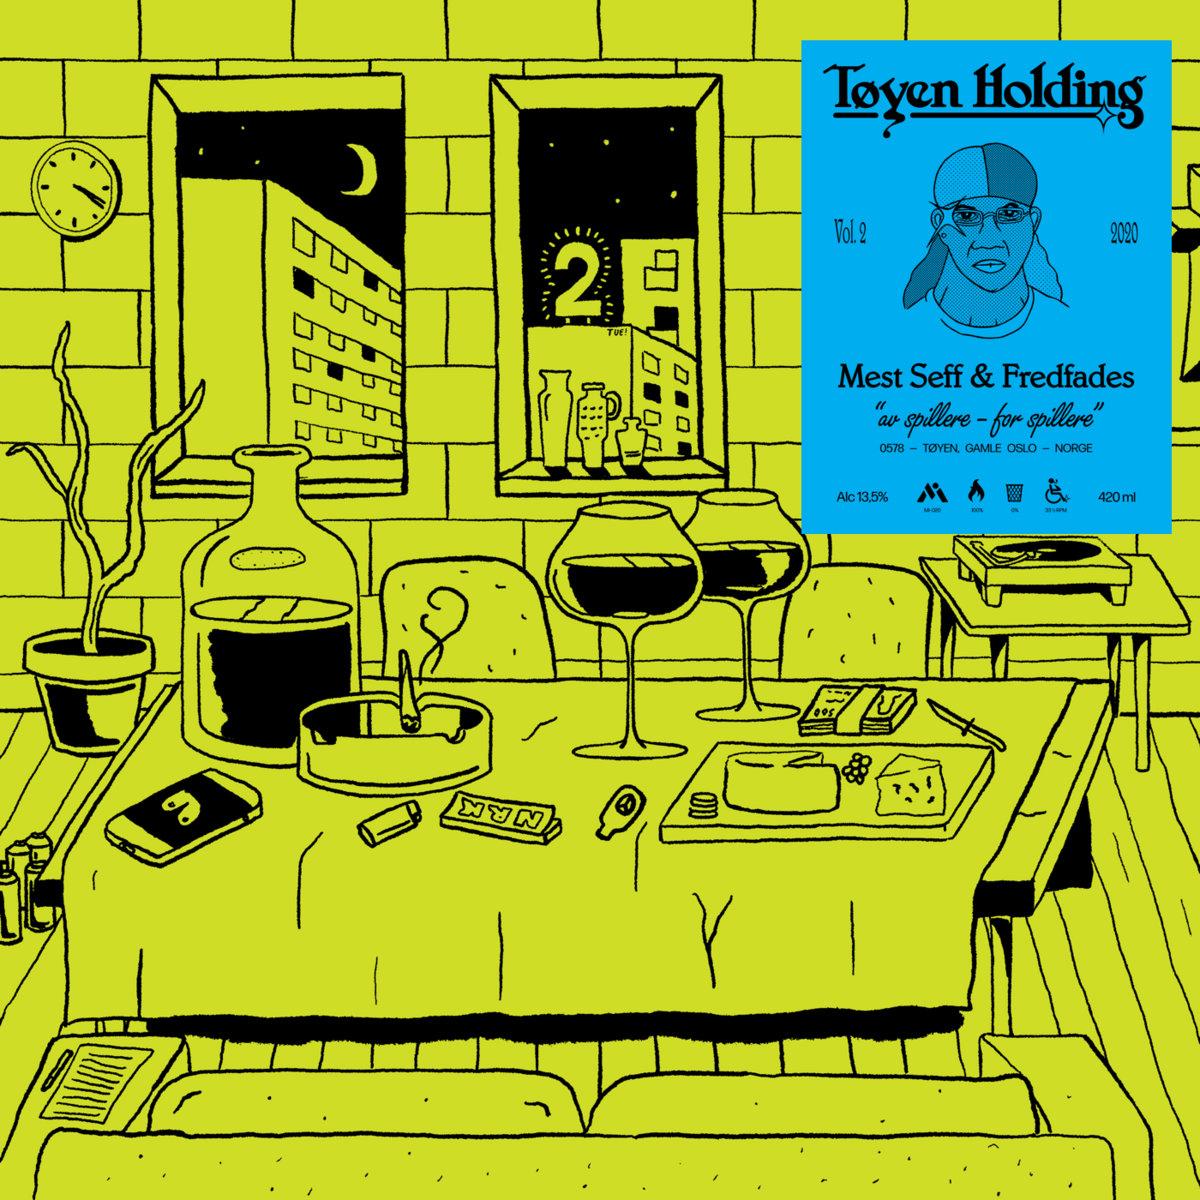 Tøyen Holding – Tøyen Holding 2 [LP]